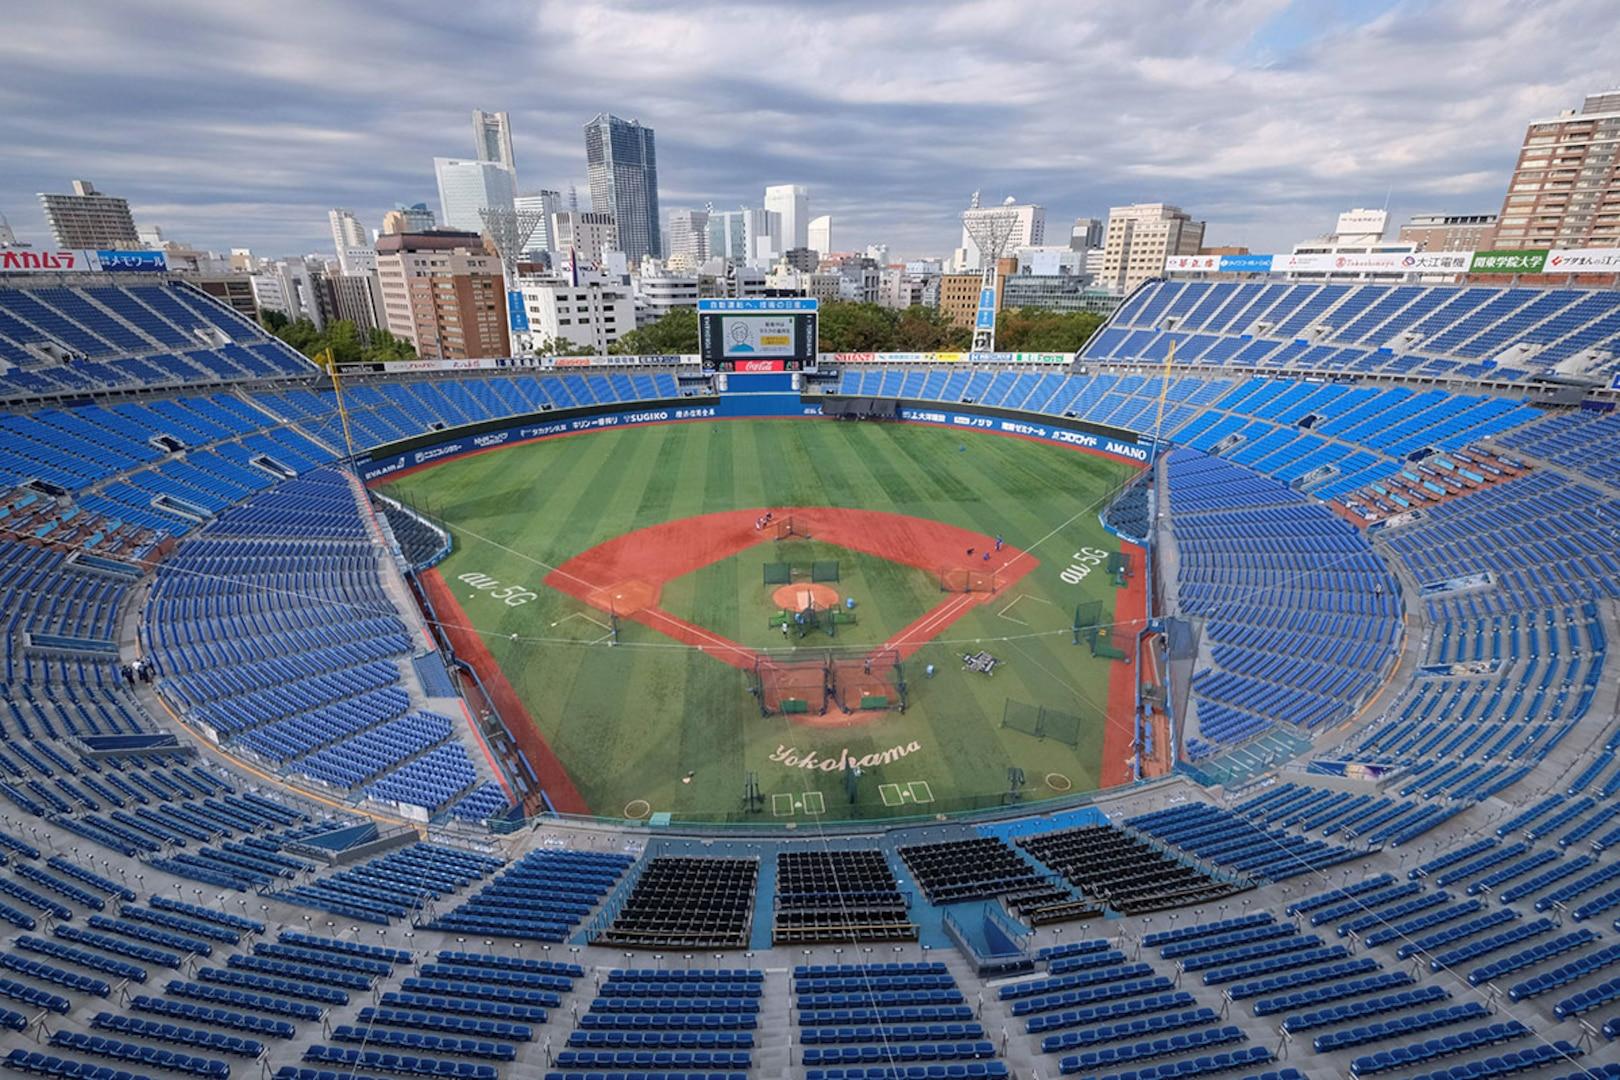 Overview shot of Yokohama Baseball Stadium